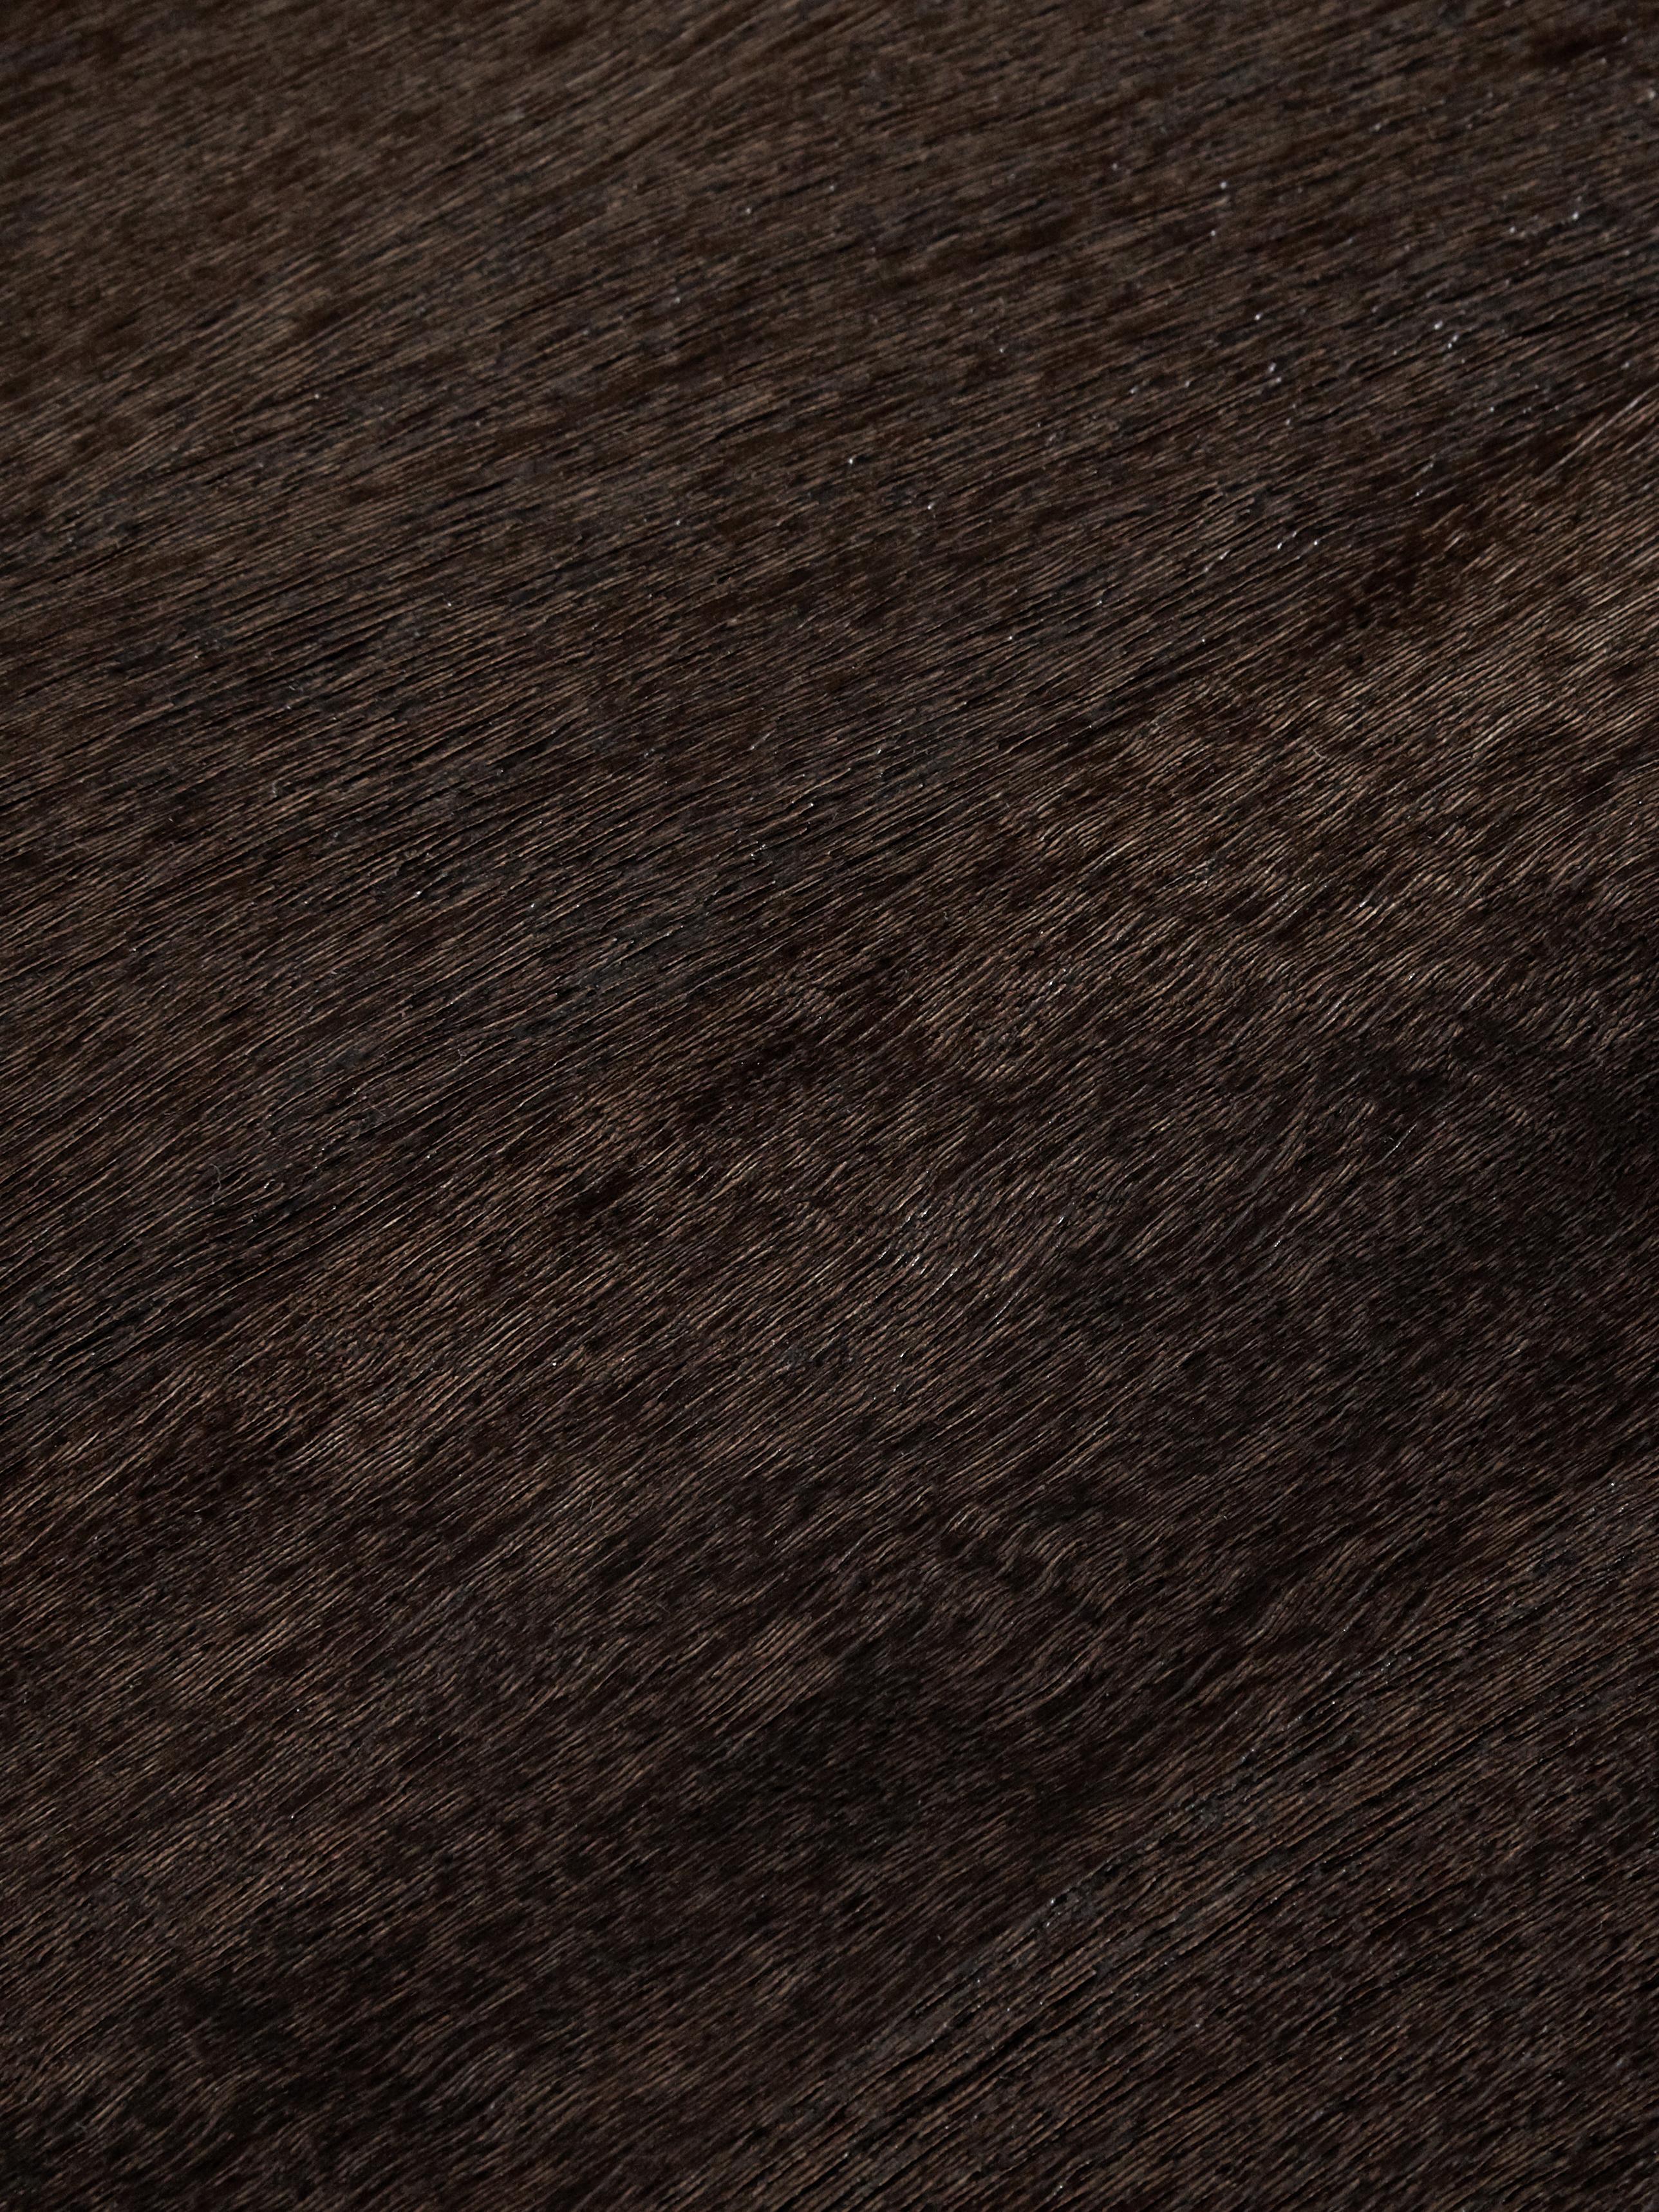 Massief houten dressoir Clive, Frame: gelakt massief mangohout, Handvatten: gepoedercoat metaal, Frame: gepoedercoat metaal, Mangohoutkleurig, goudkleurig, 150 x 85 cm